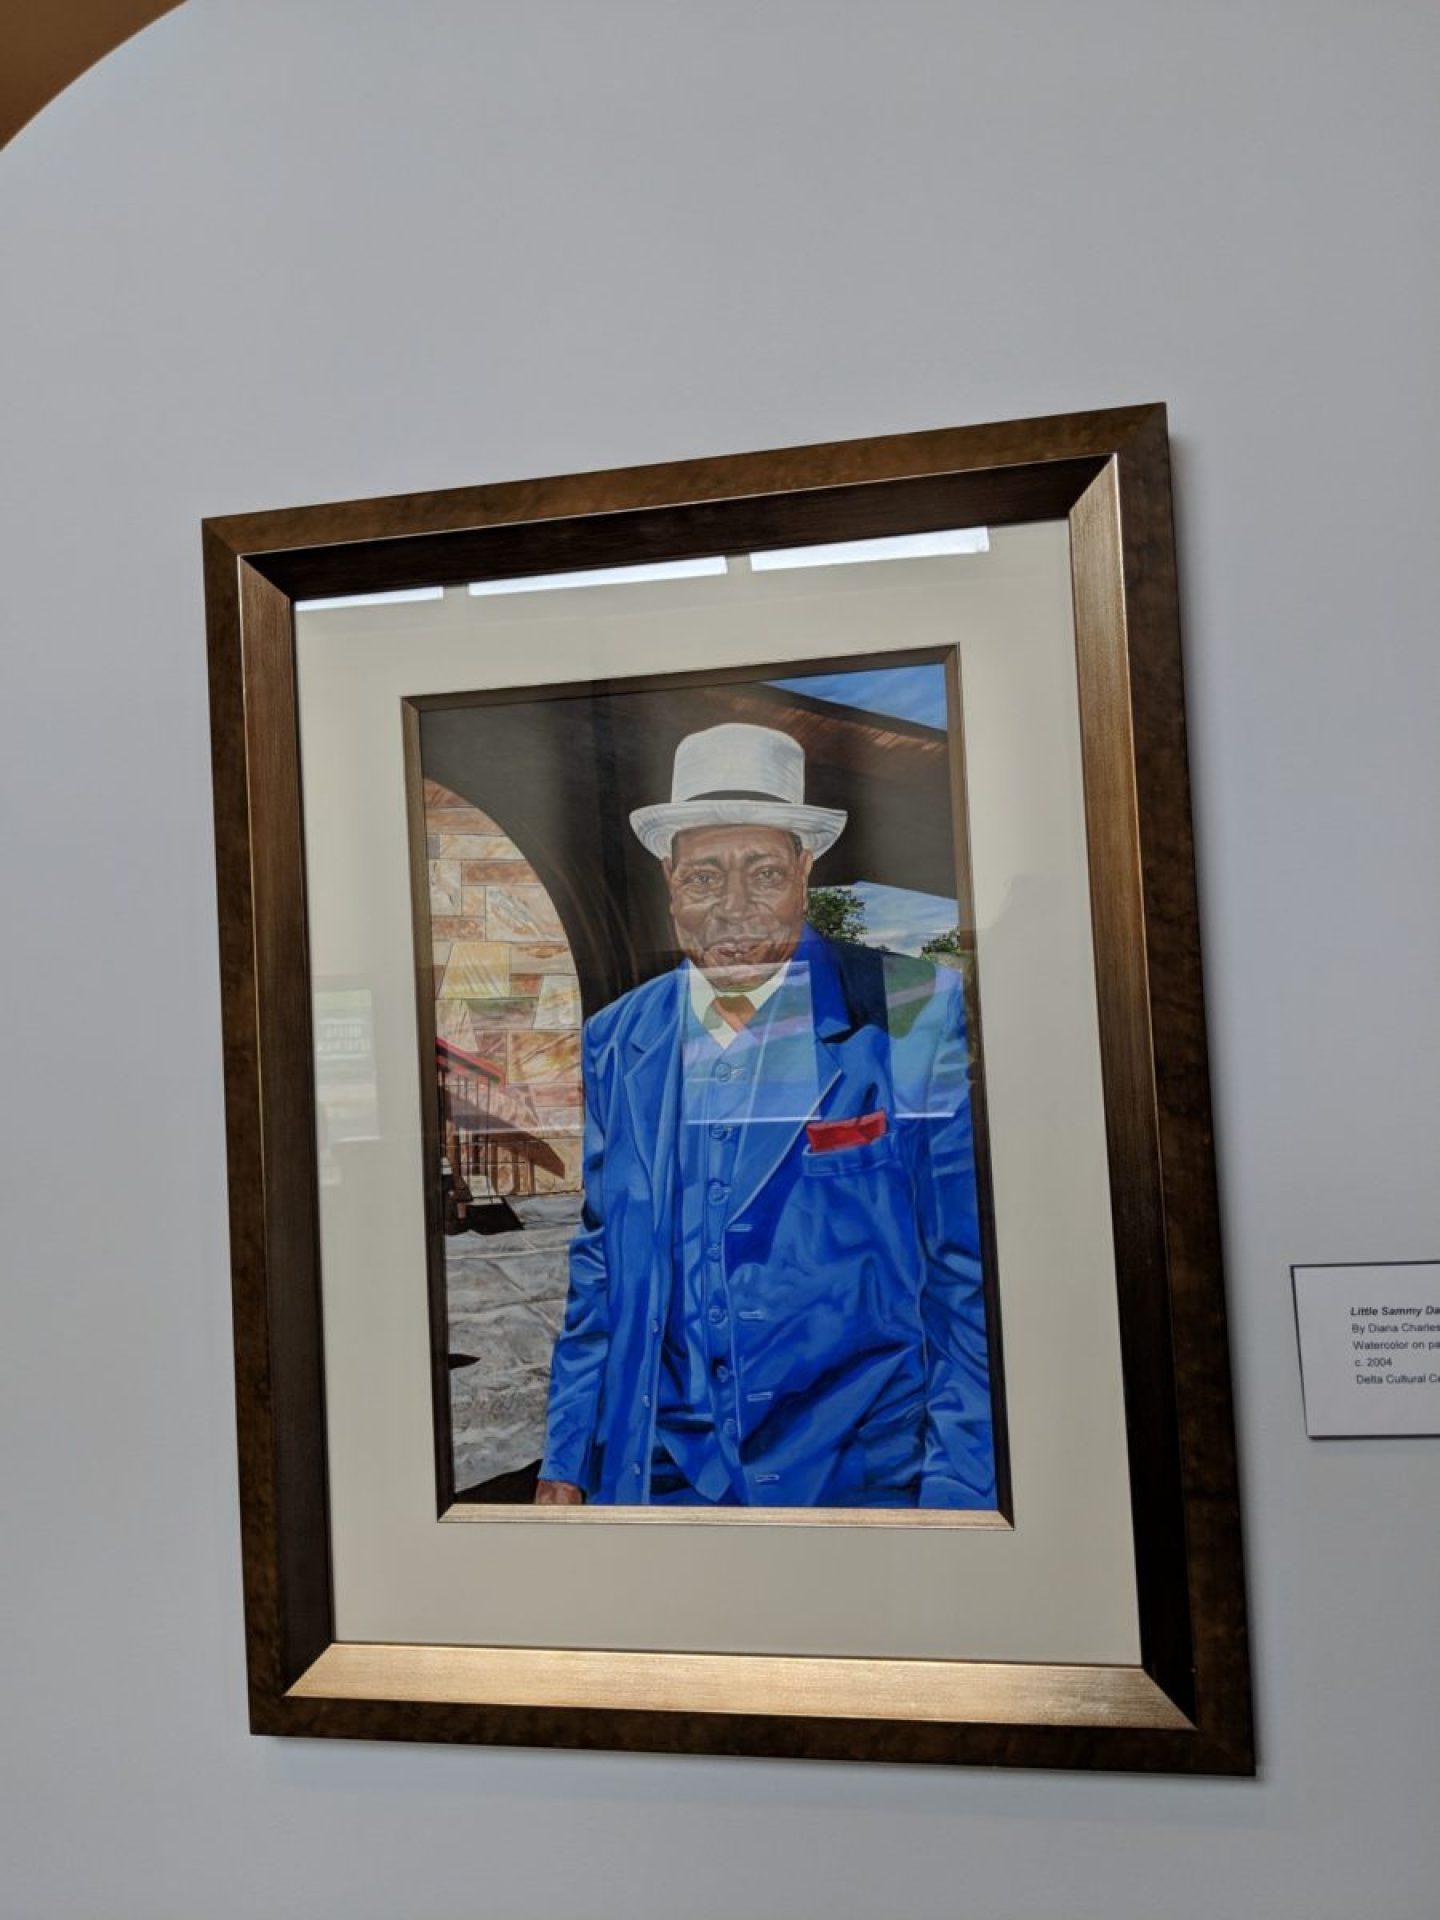 IMG_20190503_114105-1-1440x1920 Arkansas Delta Family Road Trip:  Black Heritage, Art & More!